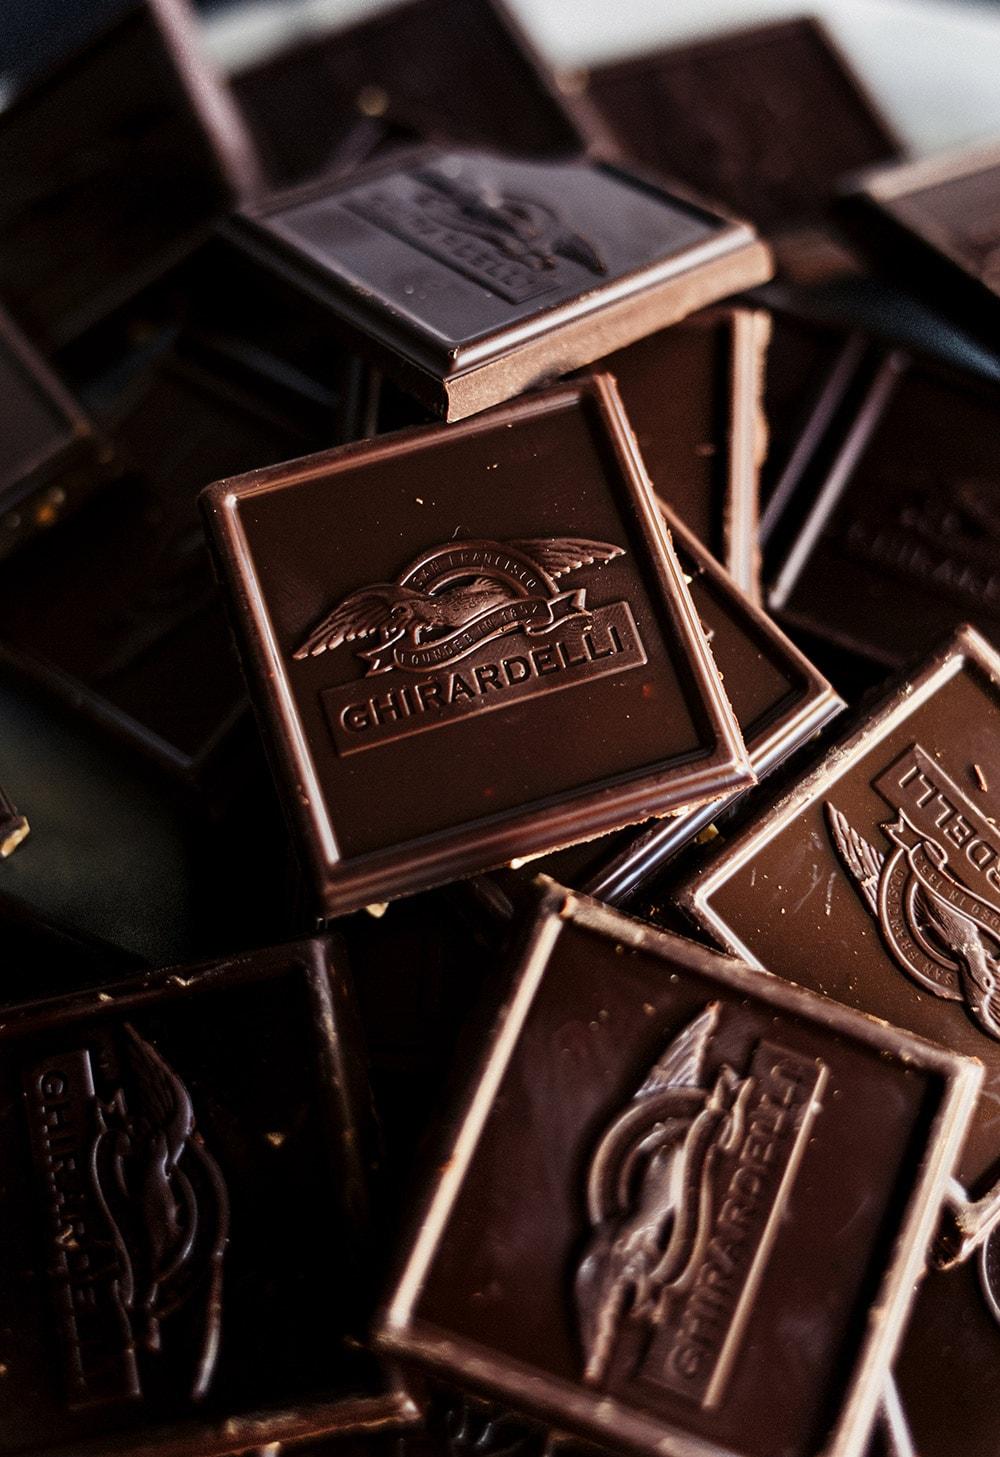 Ghirardelli Intense Dark Chocolate